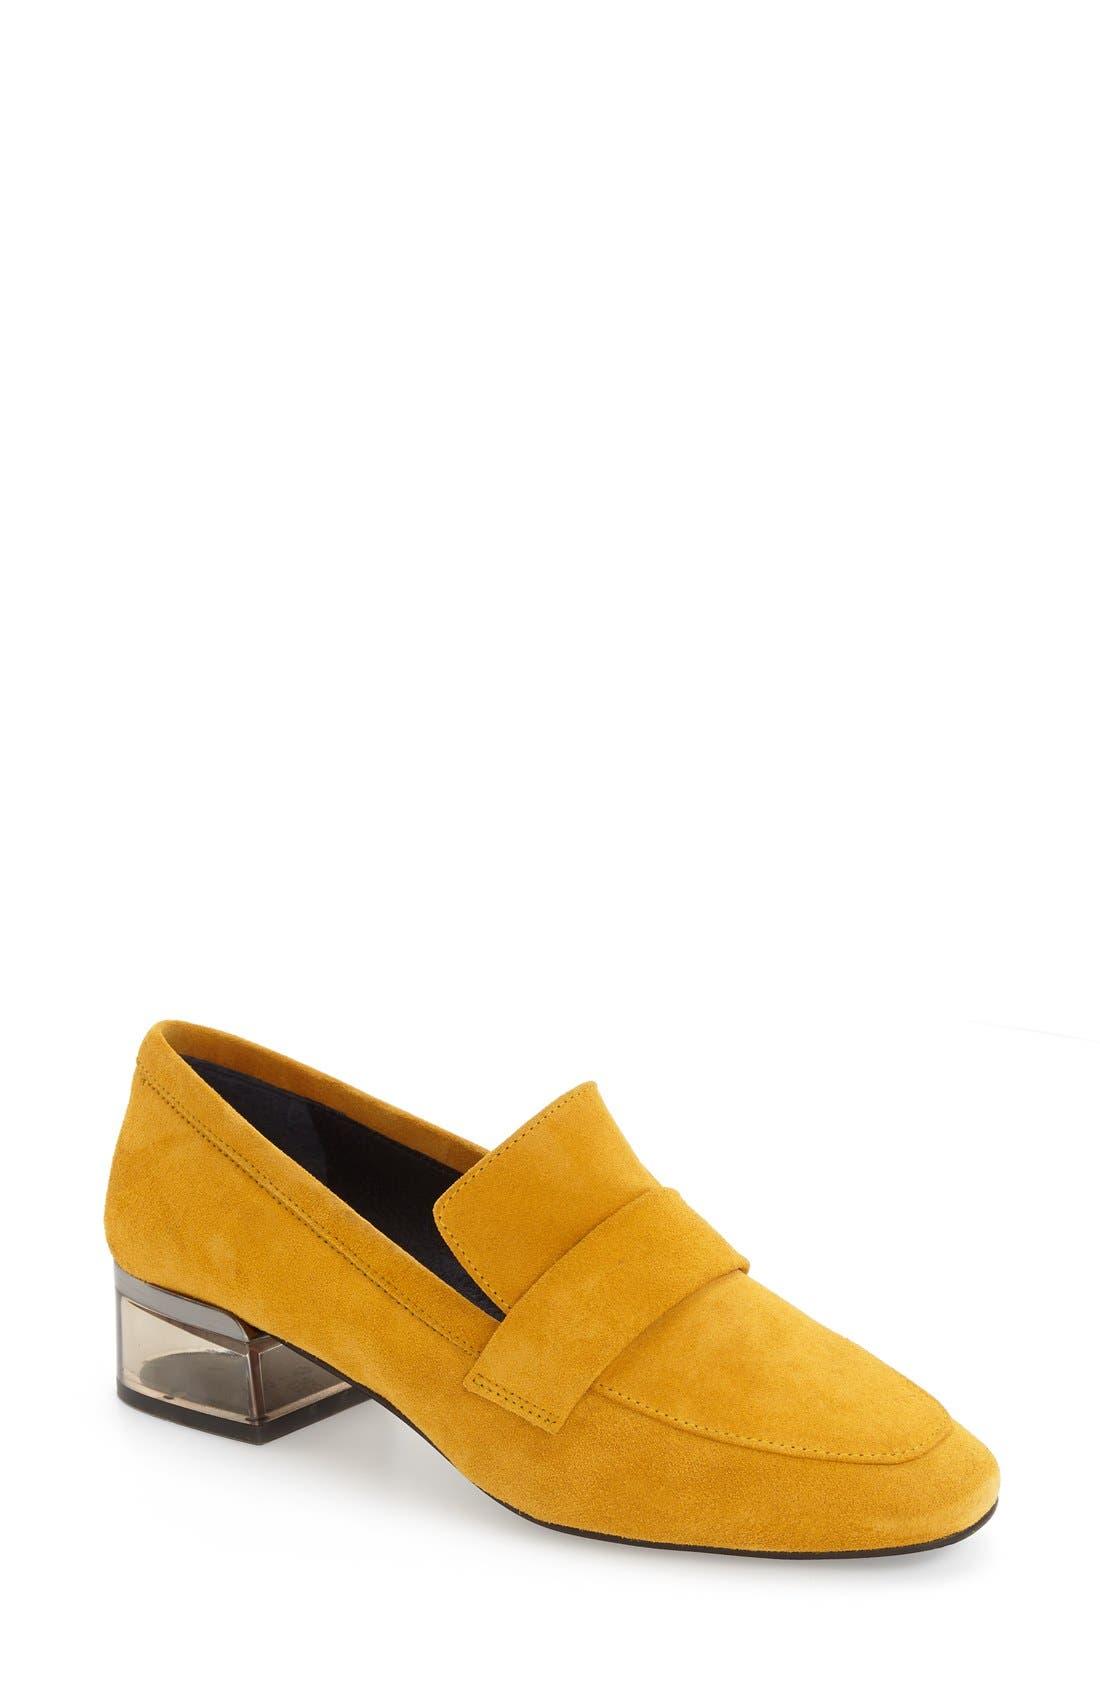 Alternate Image 1 Selected - Topshop 'Karrot' Clear Heel Loafer (Women)